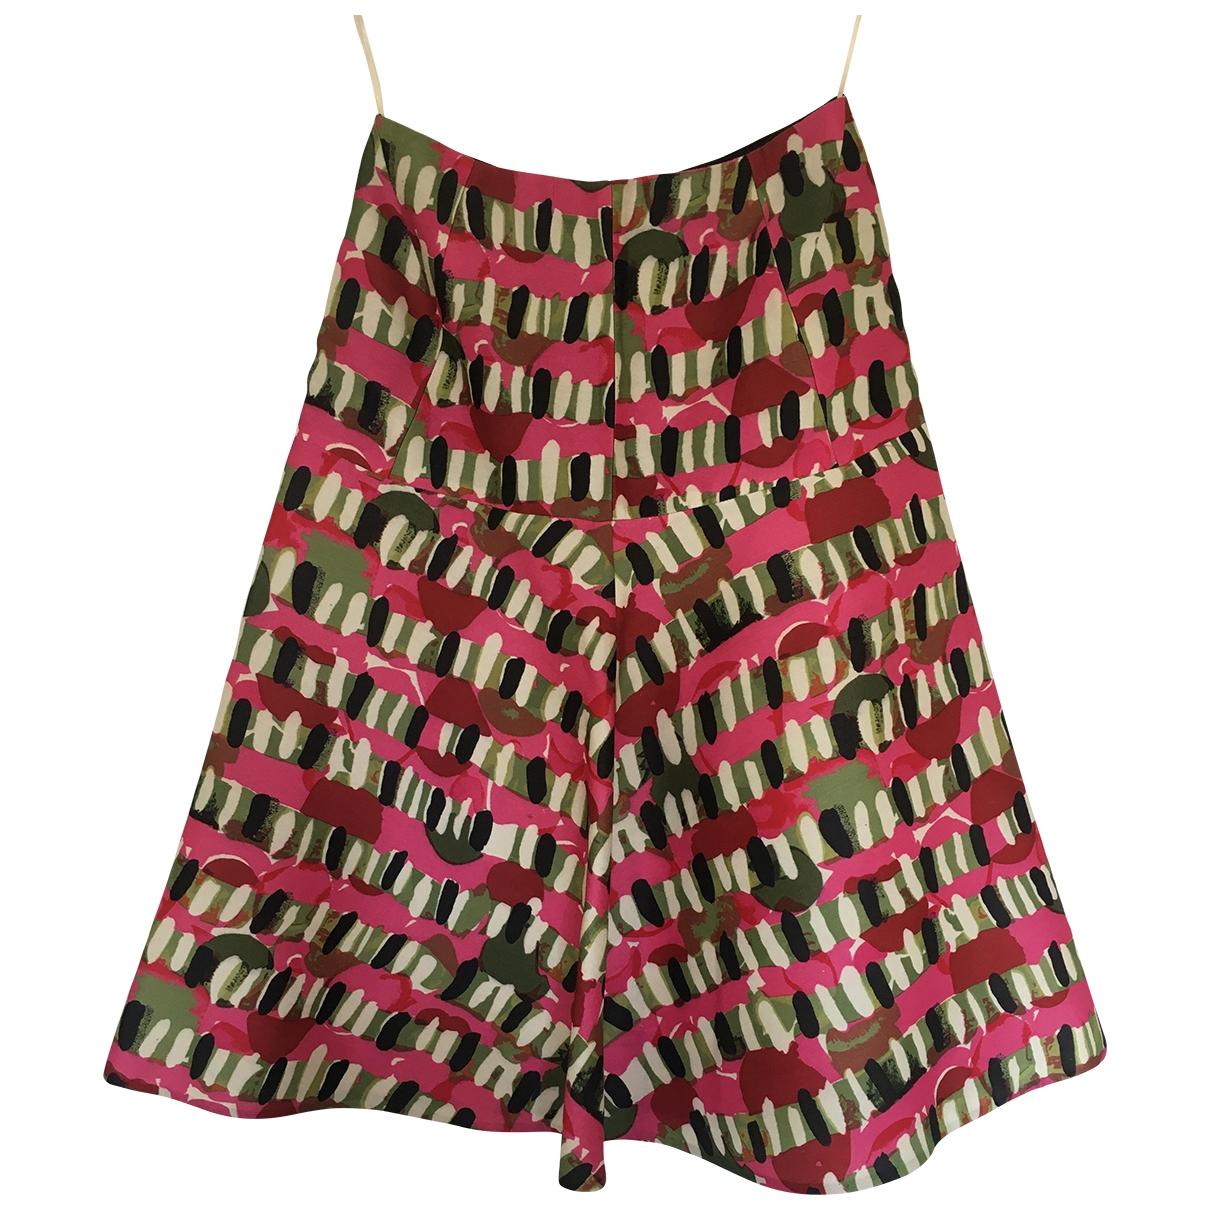 Marni \N Multicolour Wool skirt for Women 38 IT